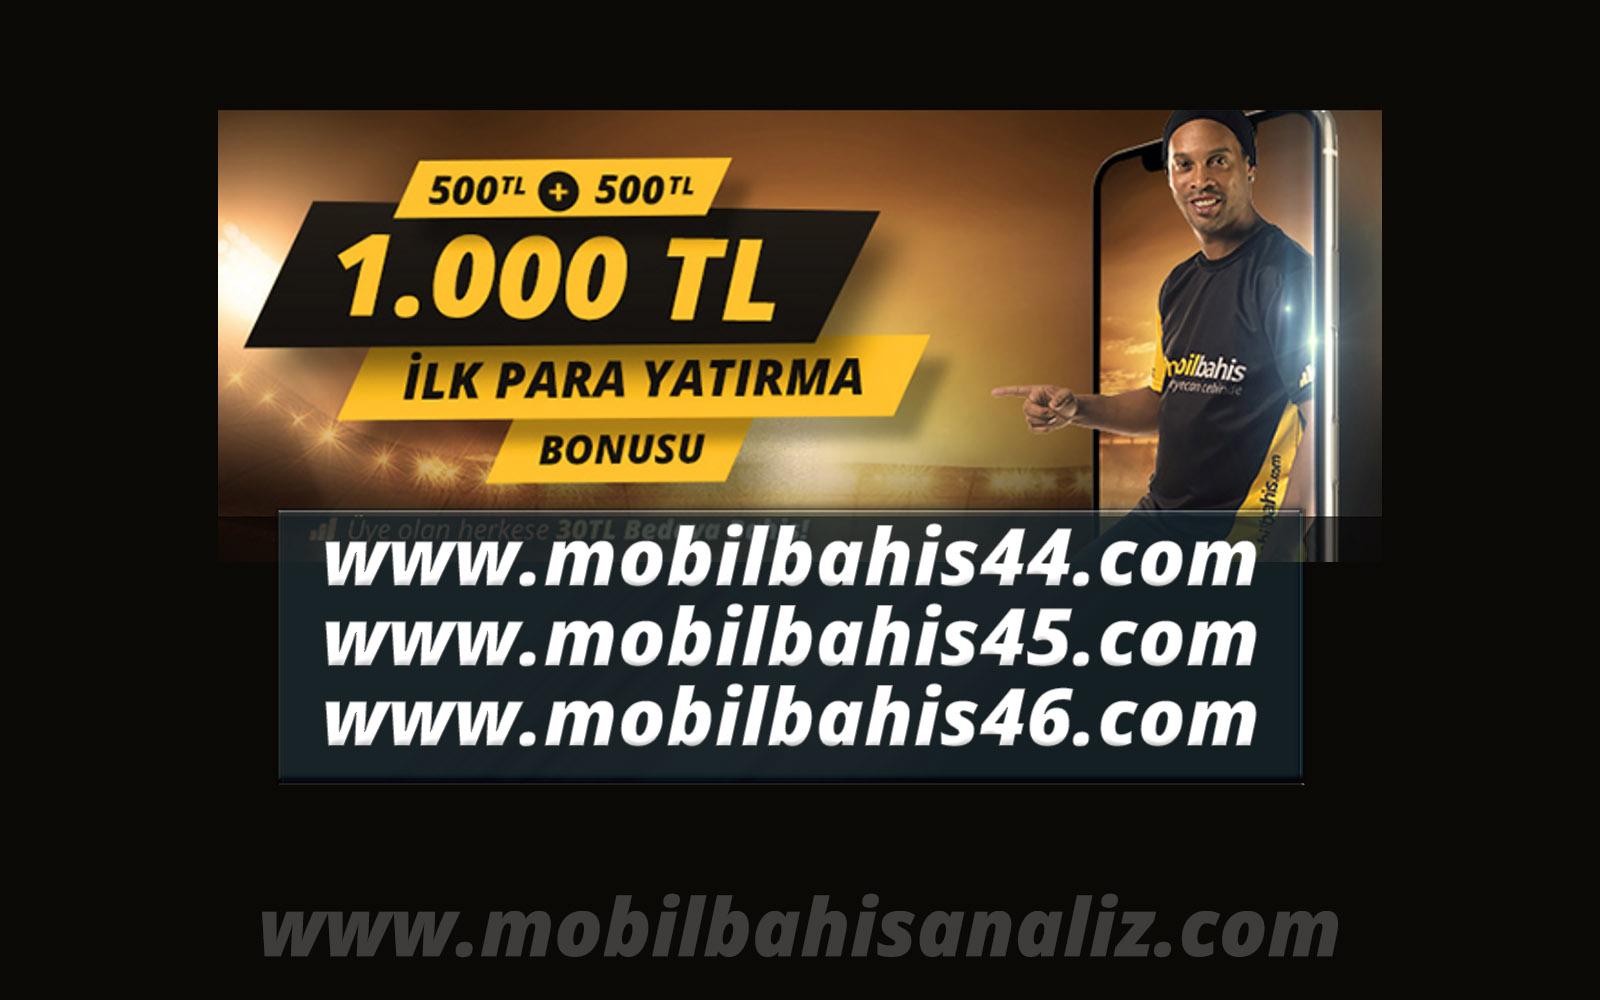 mobilbahizanaliz46-44-45